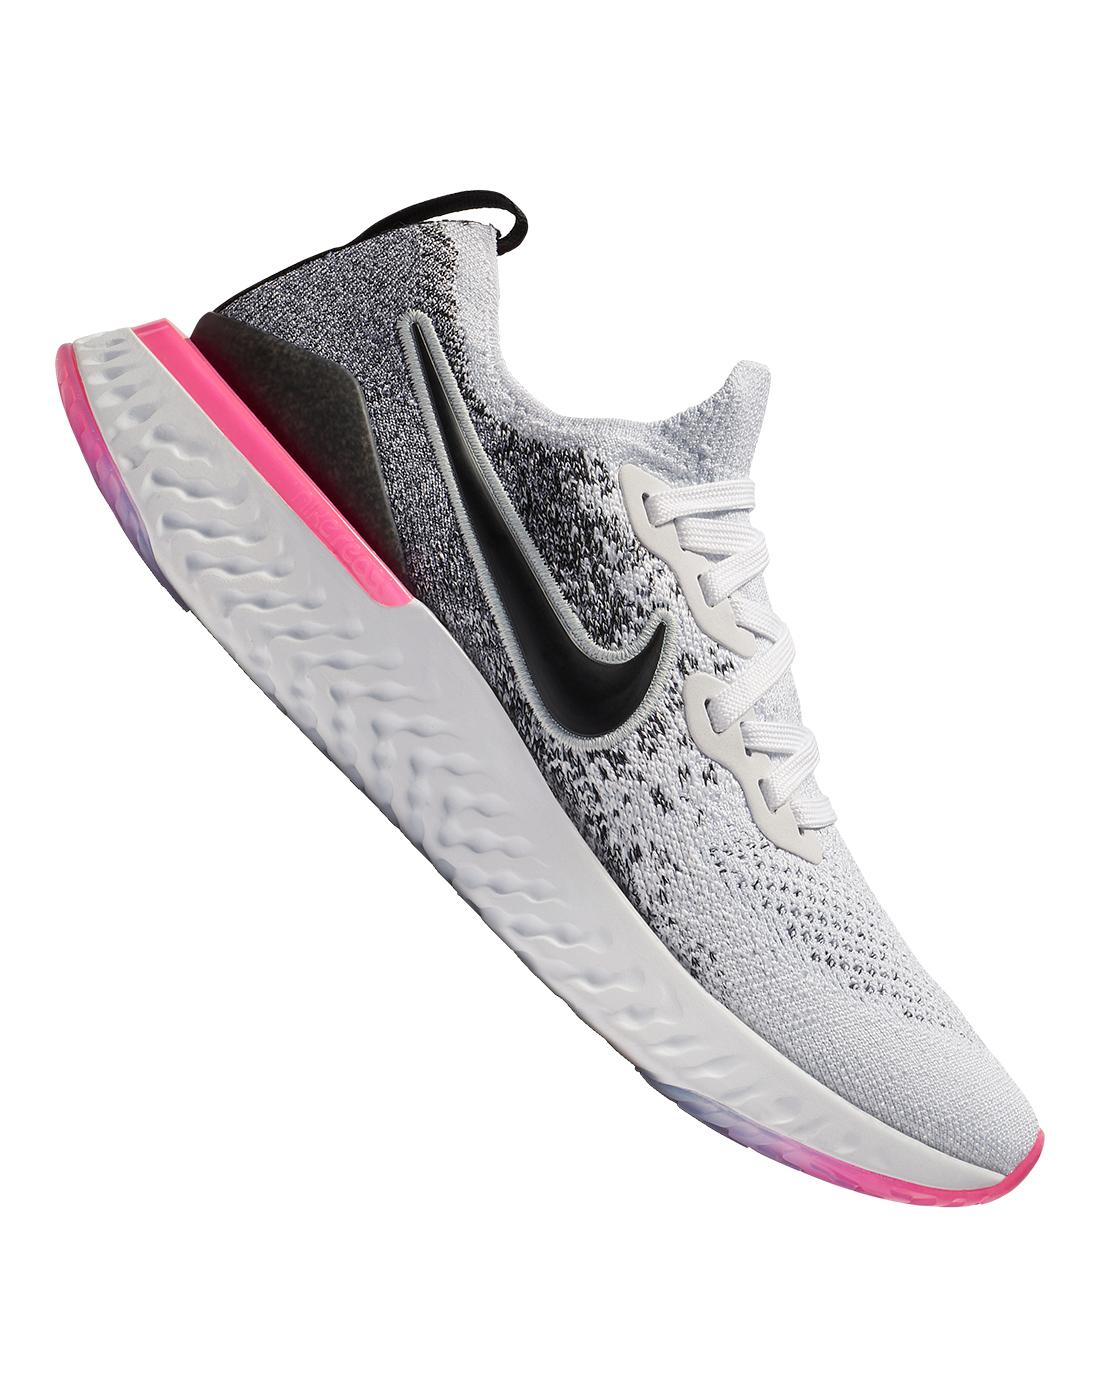 Grey \u0026 Pink Nike Epic React Flyknit